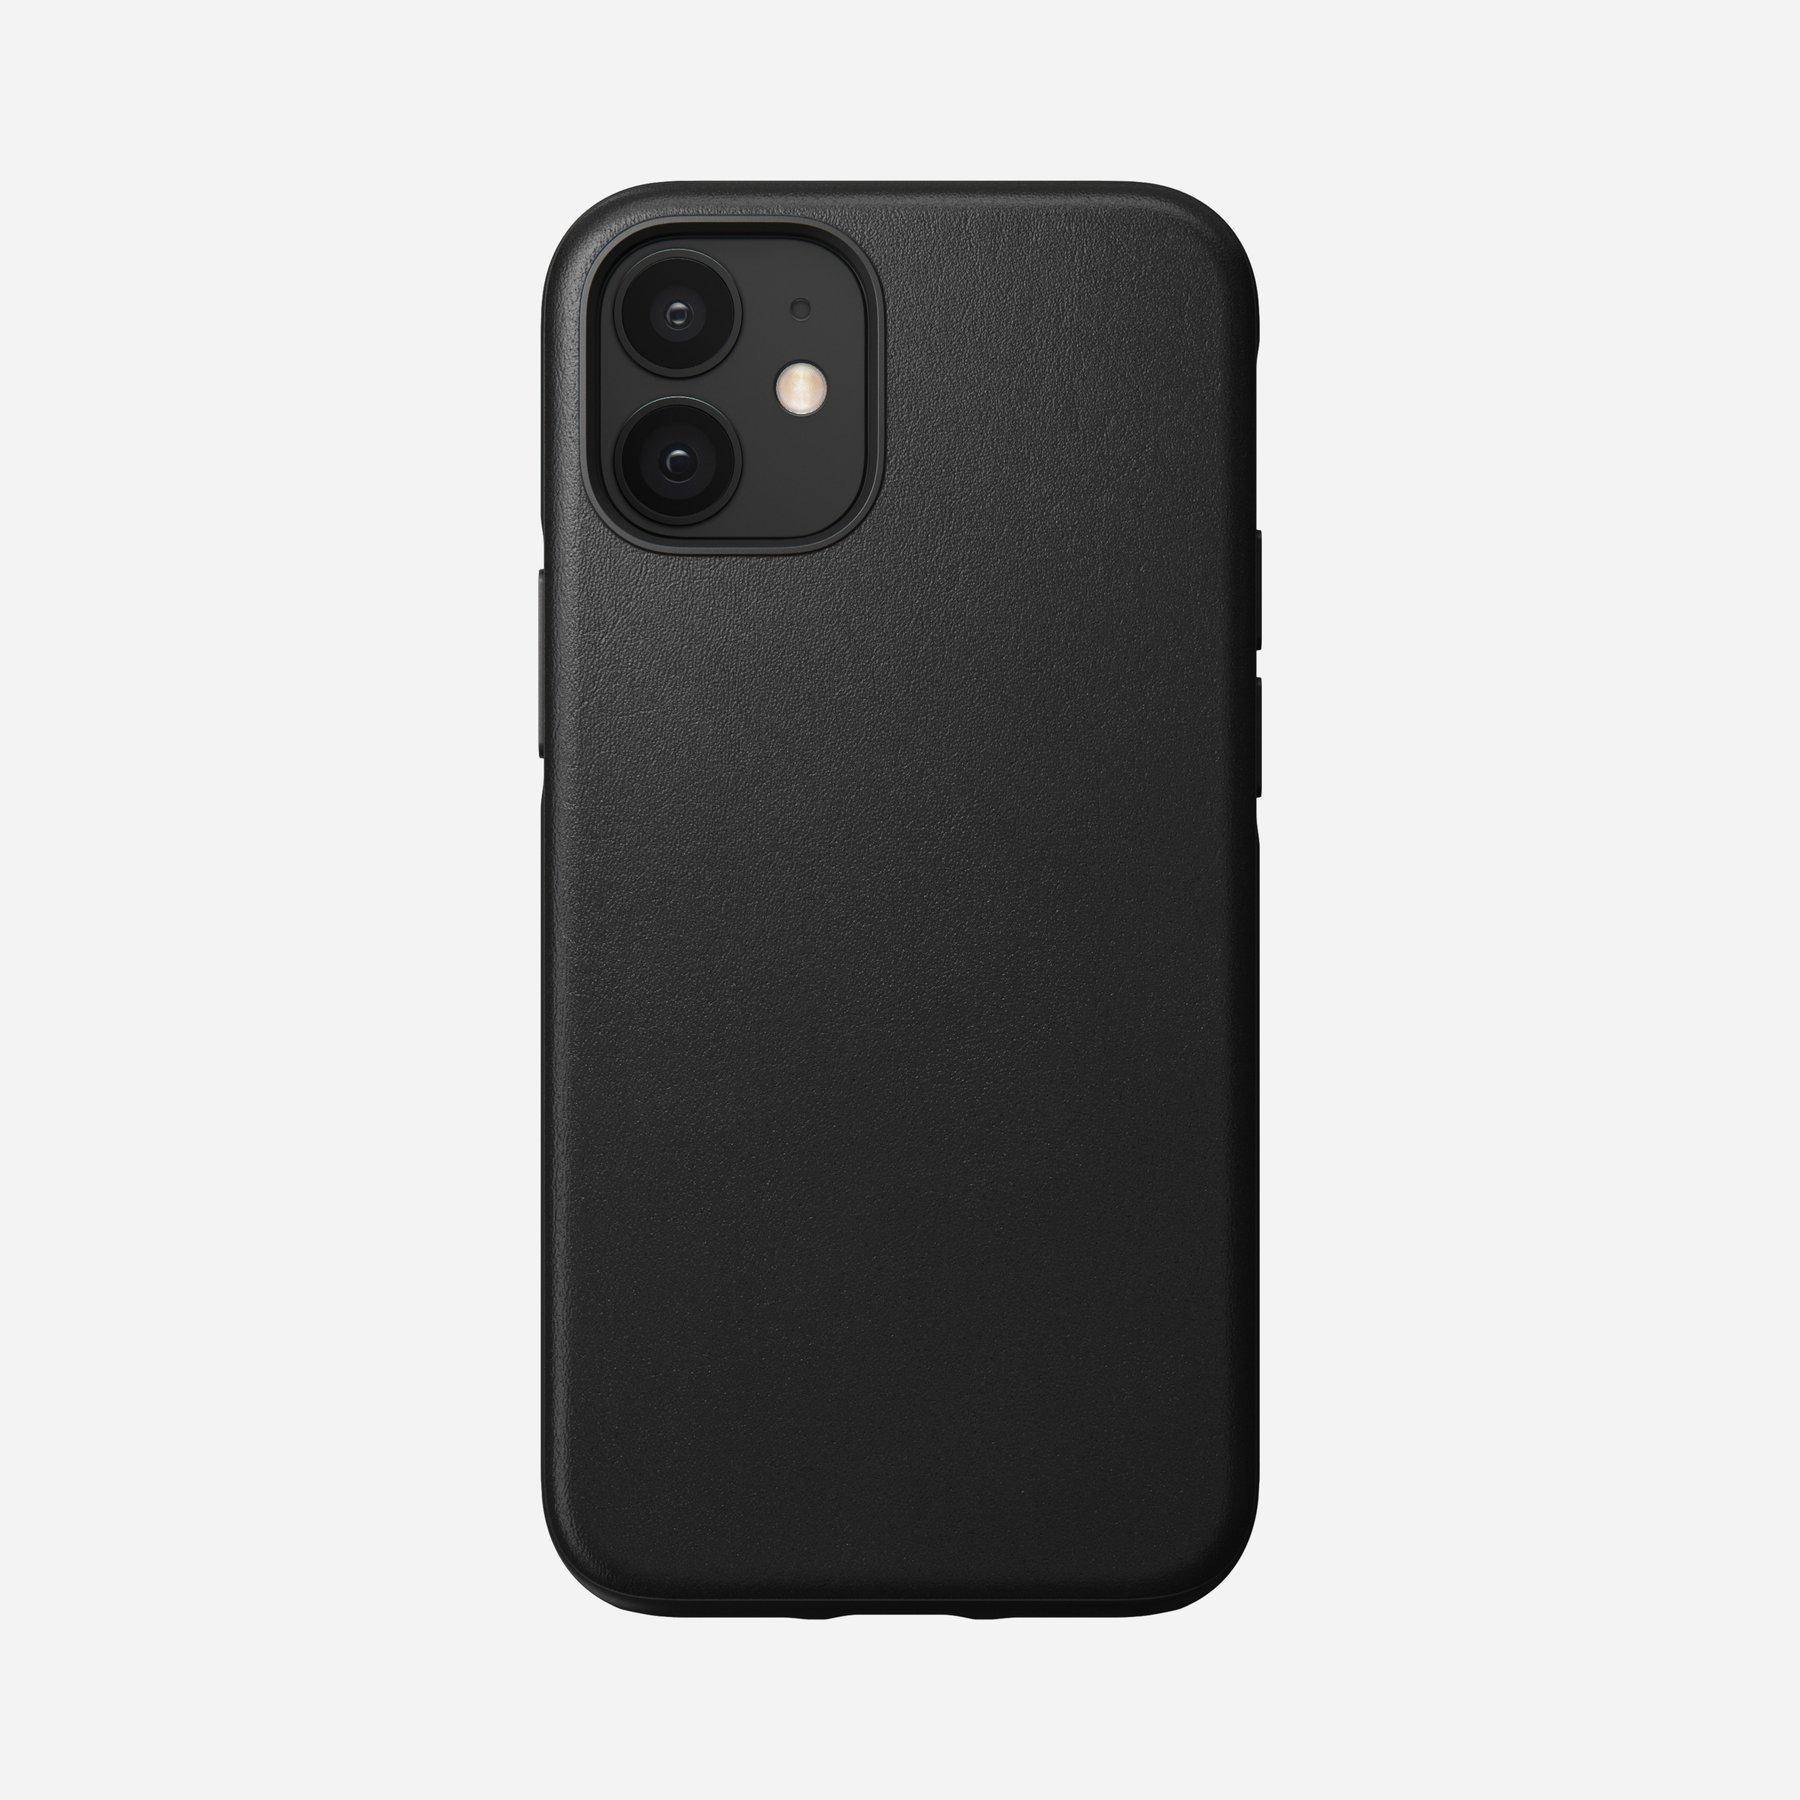 Nomad Rugged Case Black Leather für iPhone 12 Mini